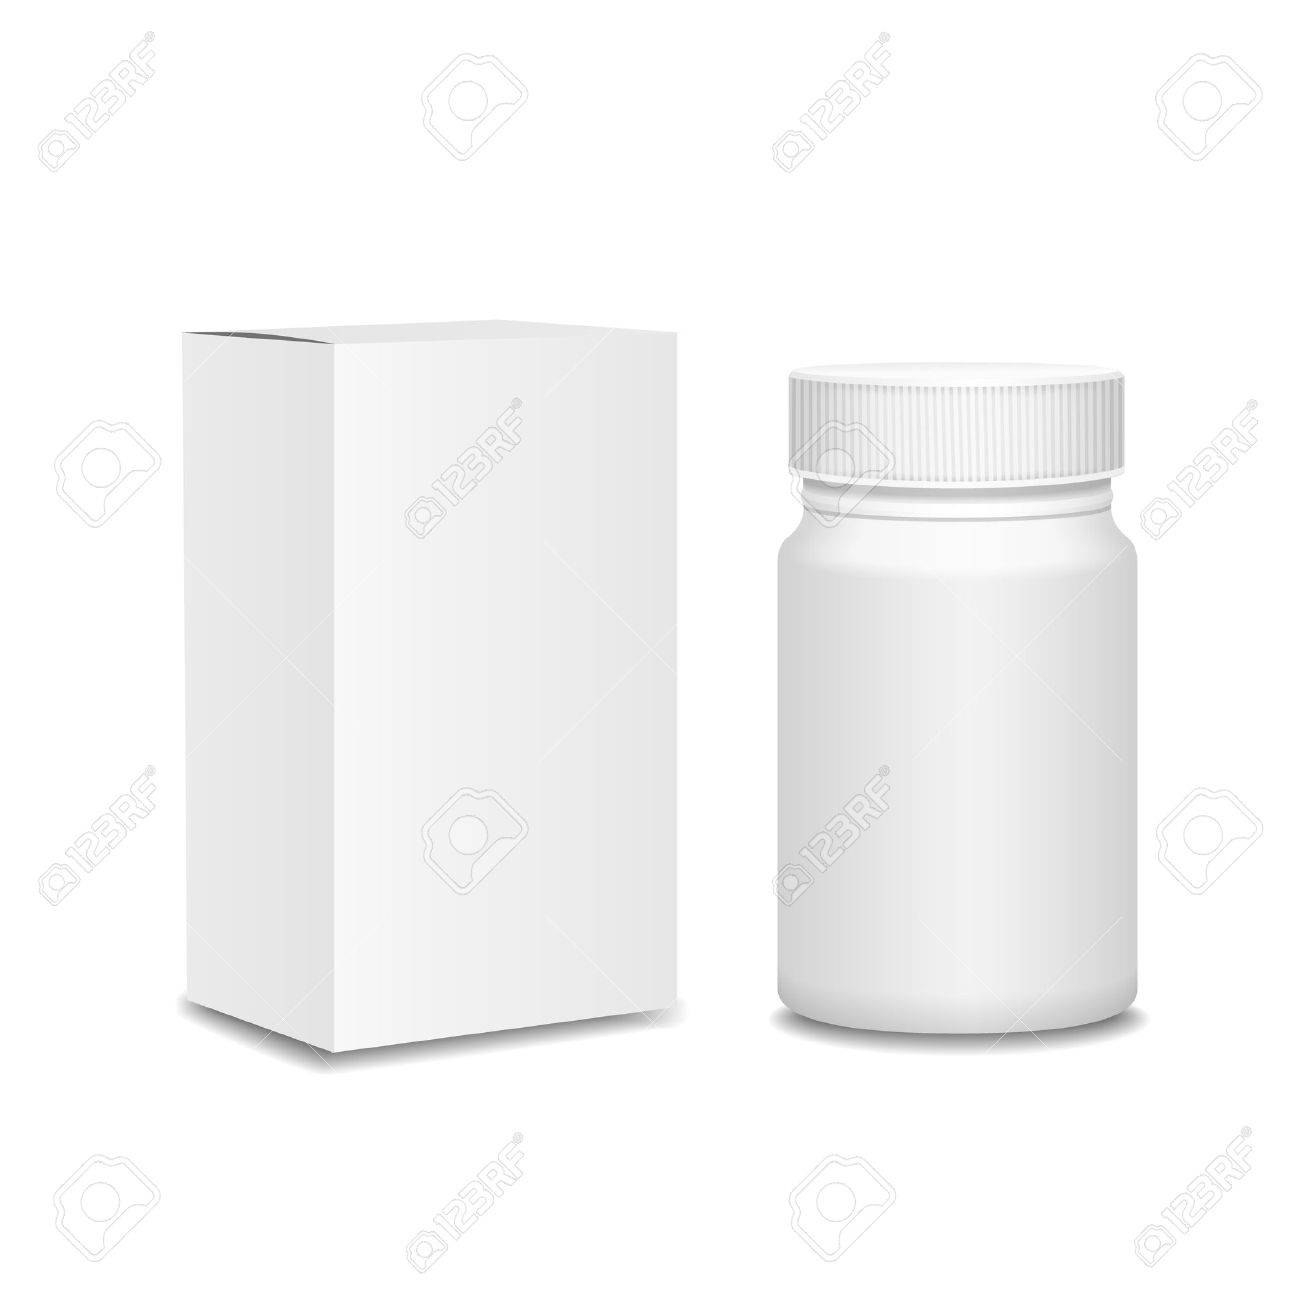 Blank Medicine Bottle And Cardboard Packaging Vitamins Examples Inside Blank Packaging Templates